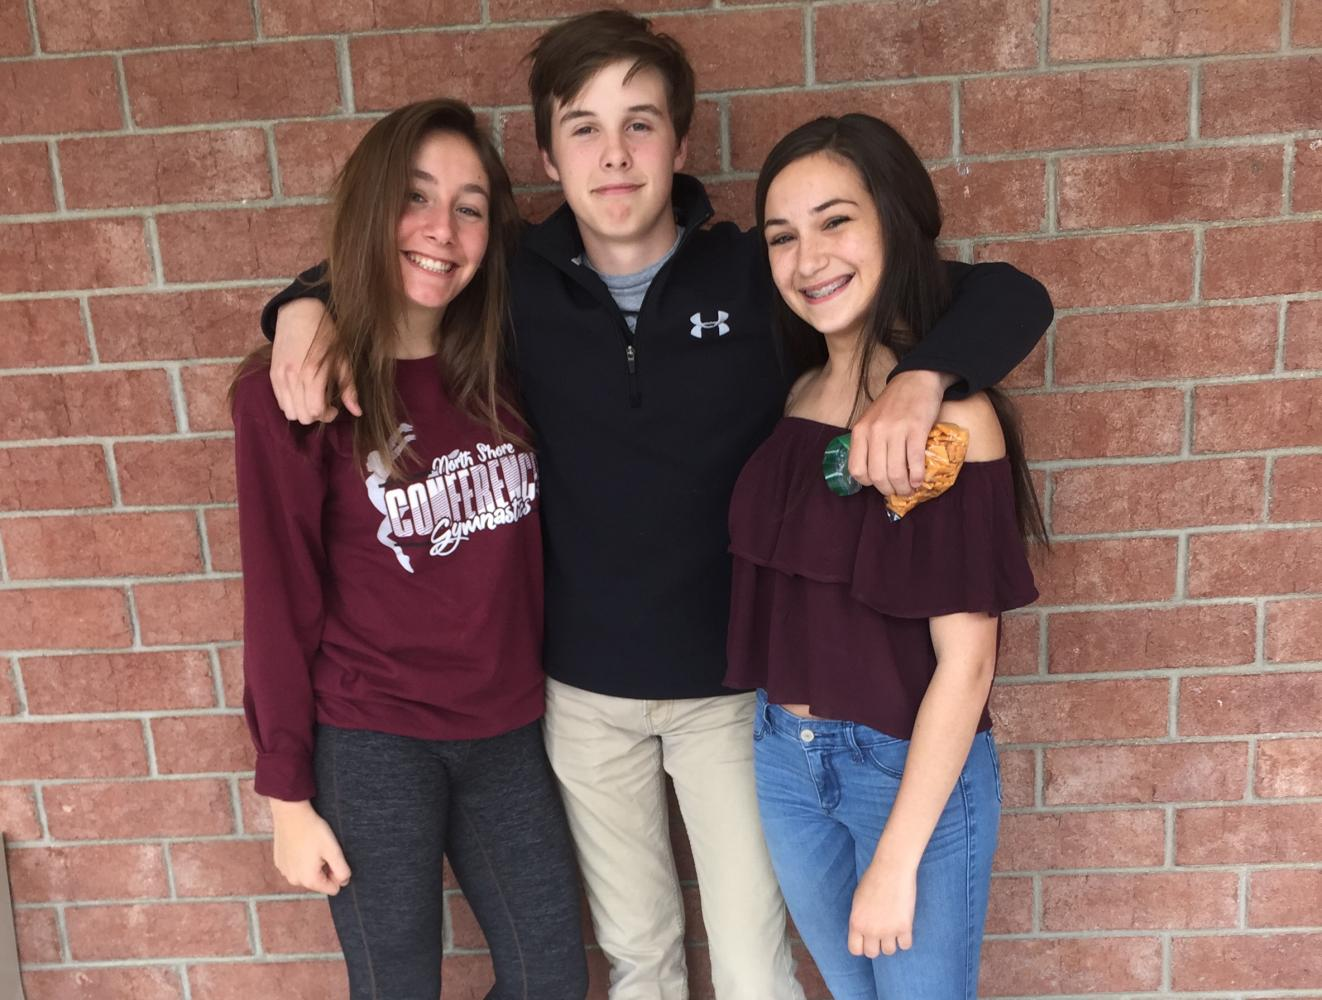 Jack Simon (center), freshman poses with Isabella Bonfiglio (left), and Samantha Haller (right), freshmen.